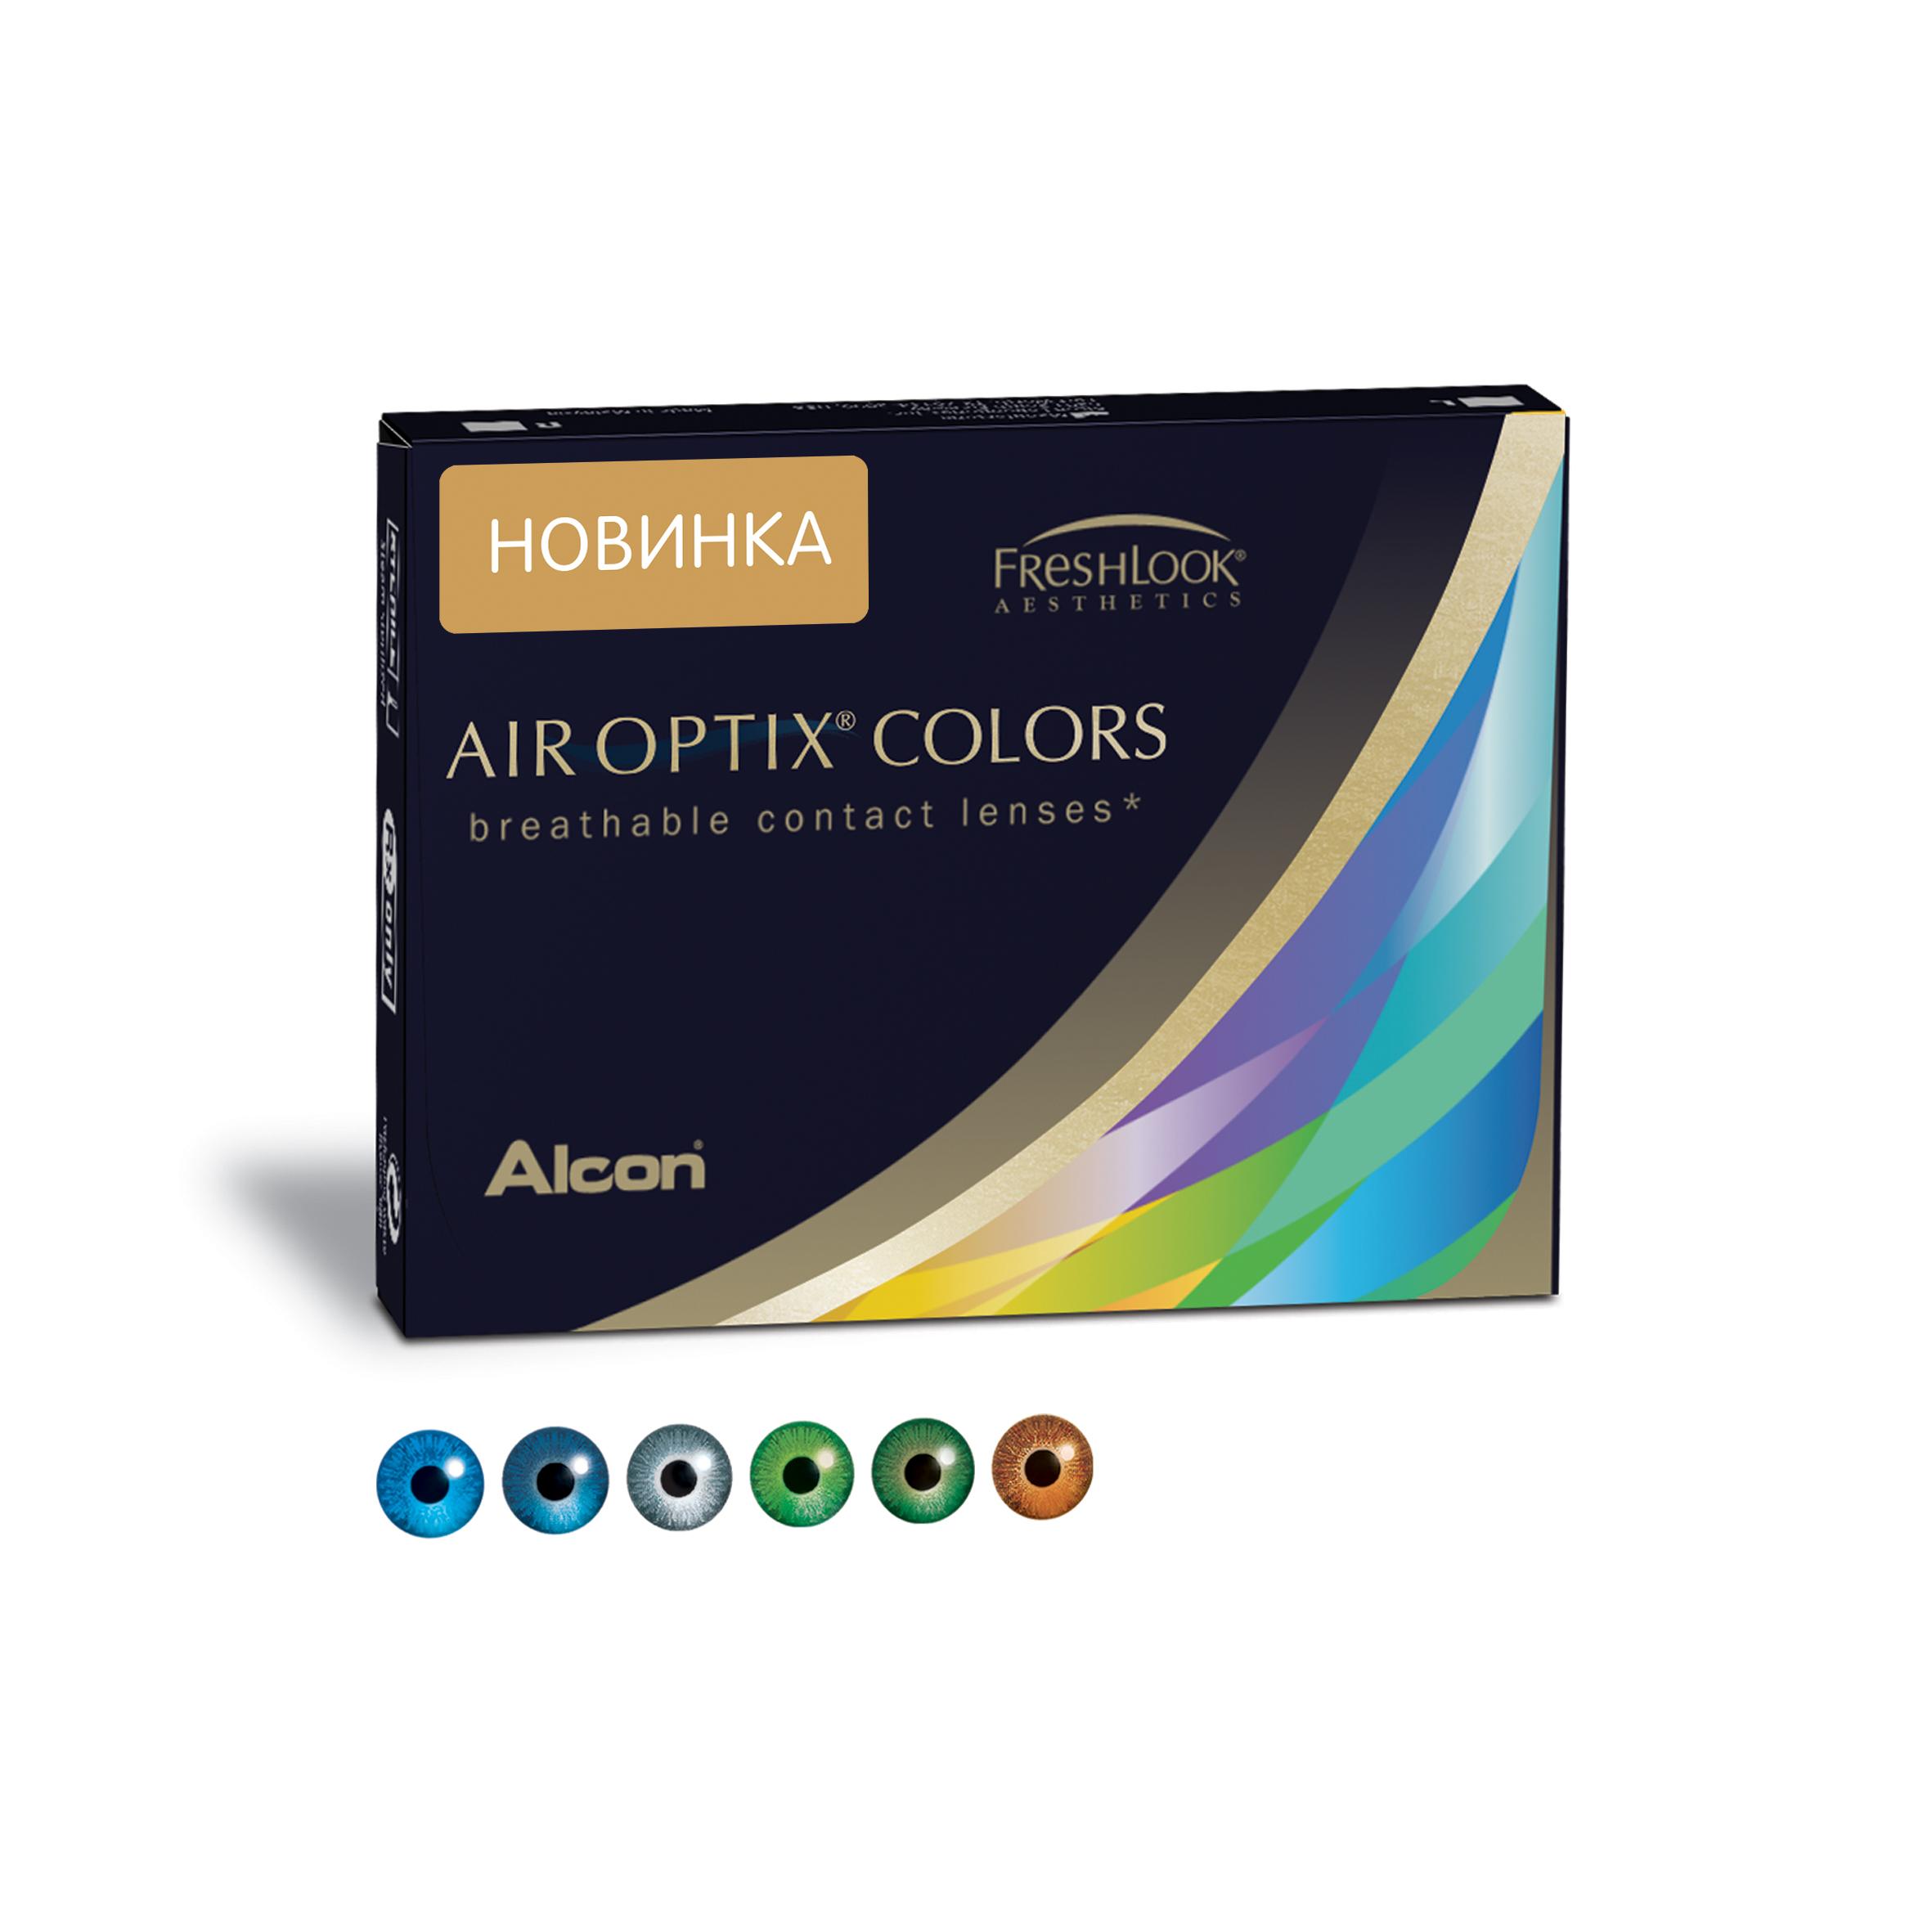 Аlcon контактные линзы Air Optix Colors 2 шт -5.25 Honey31746280Мягкие контактные линзы